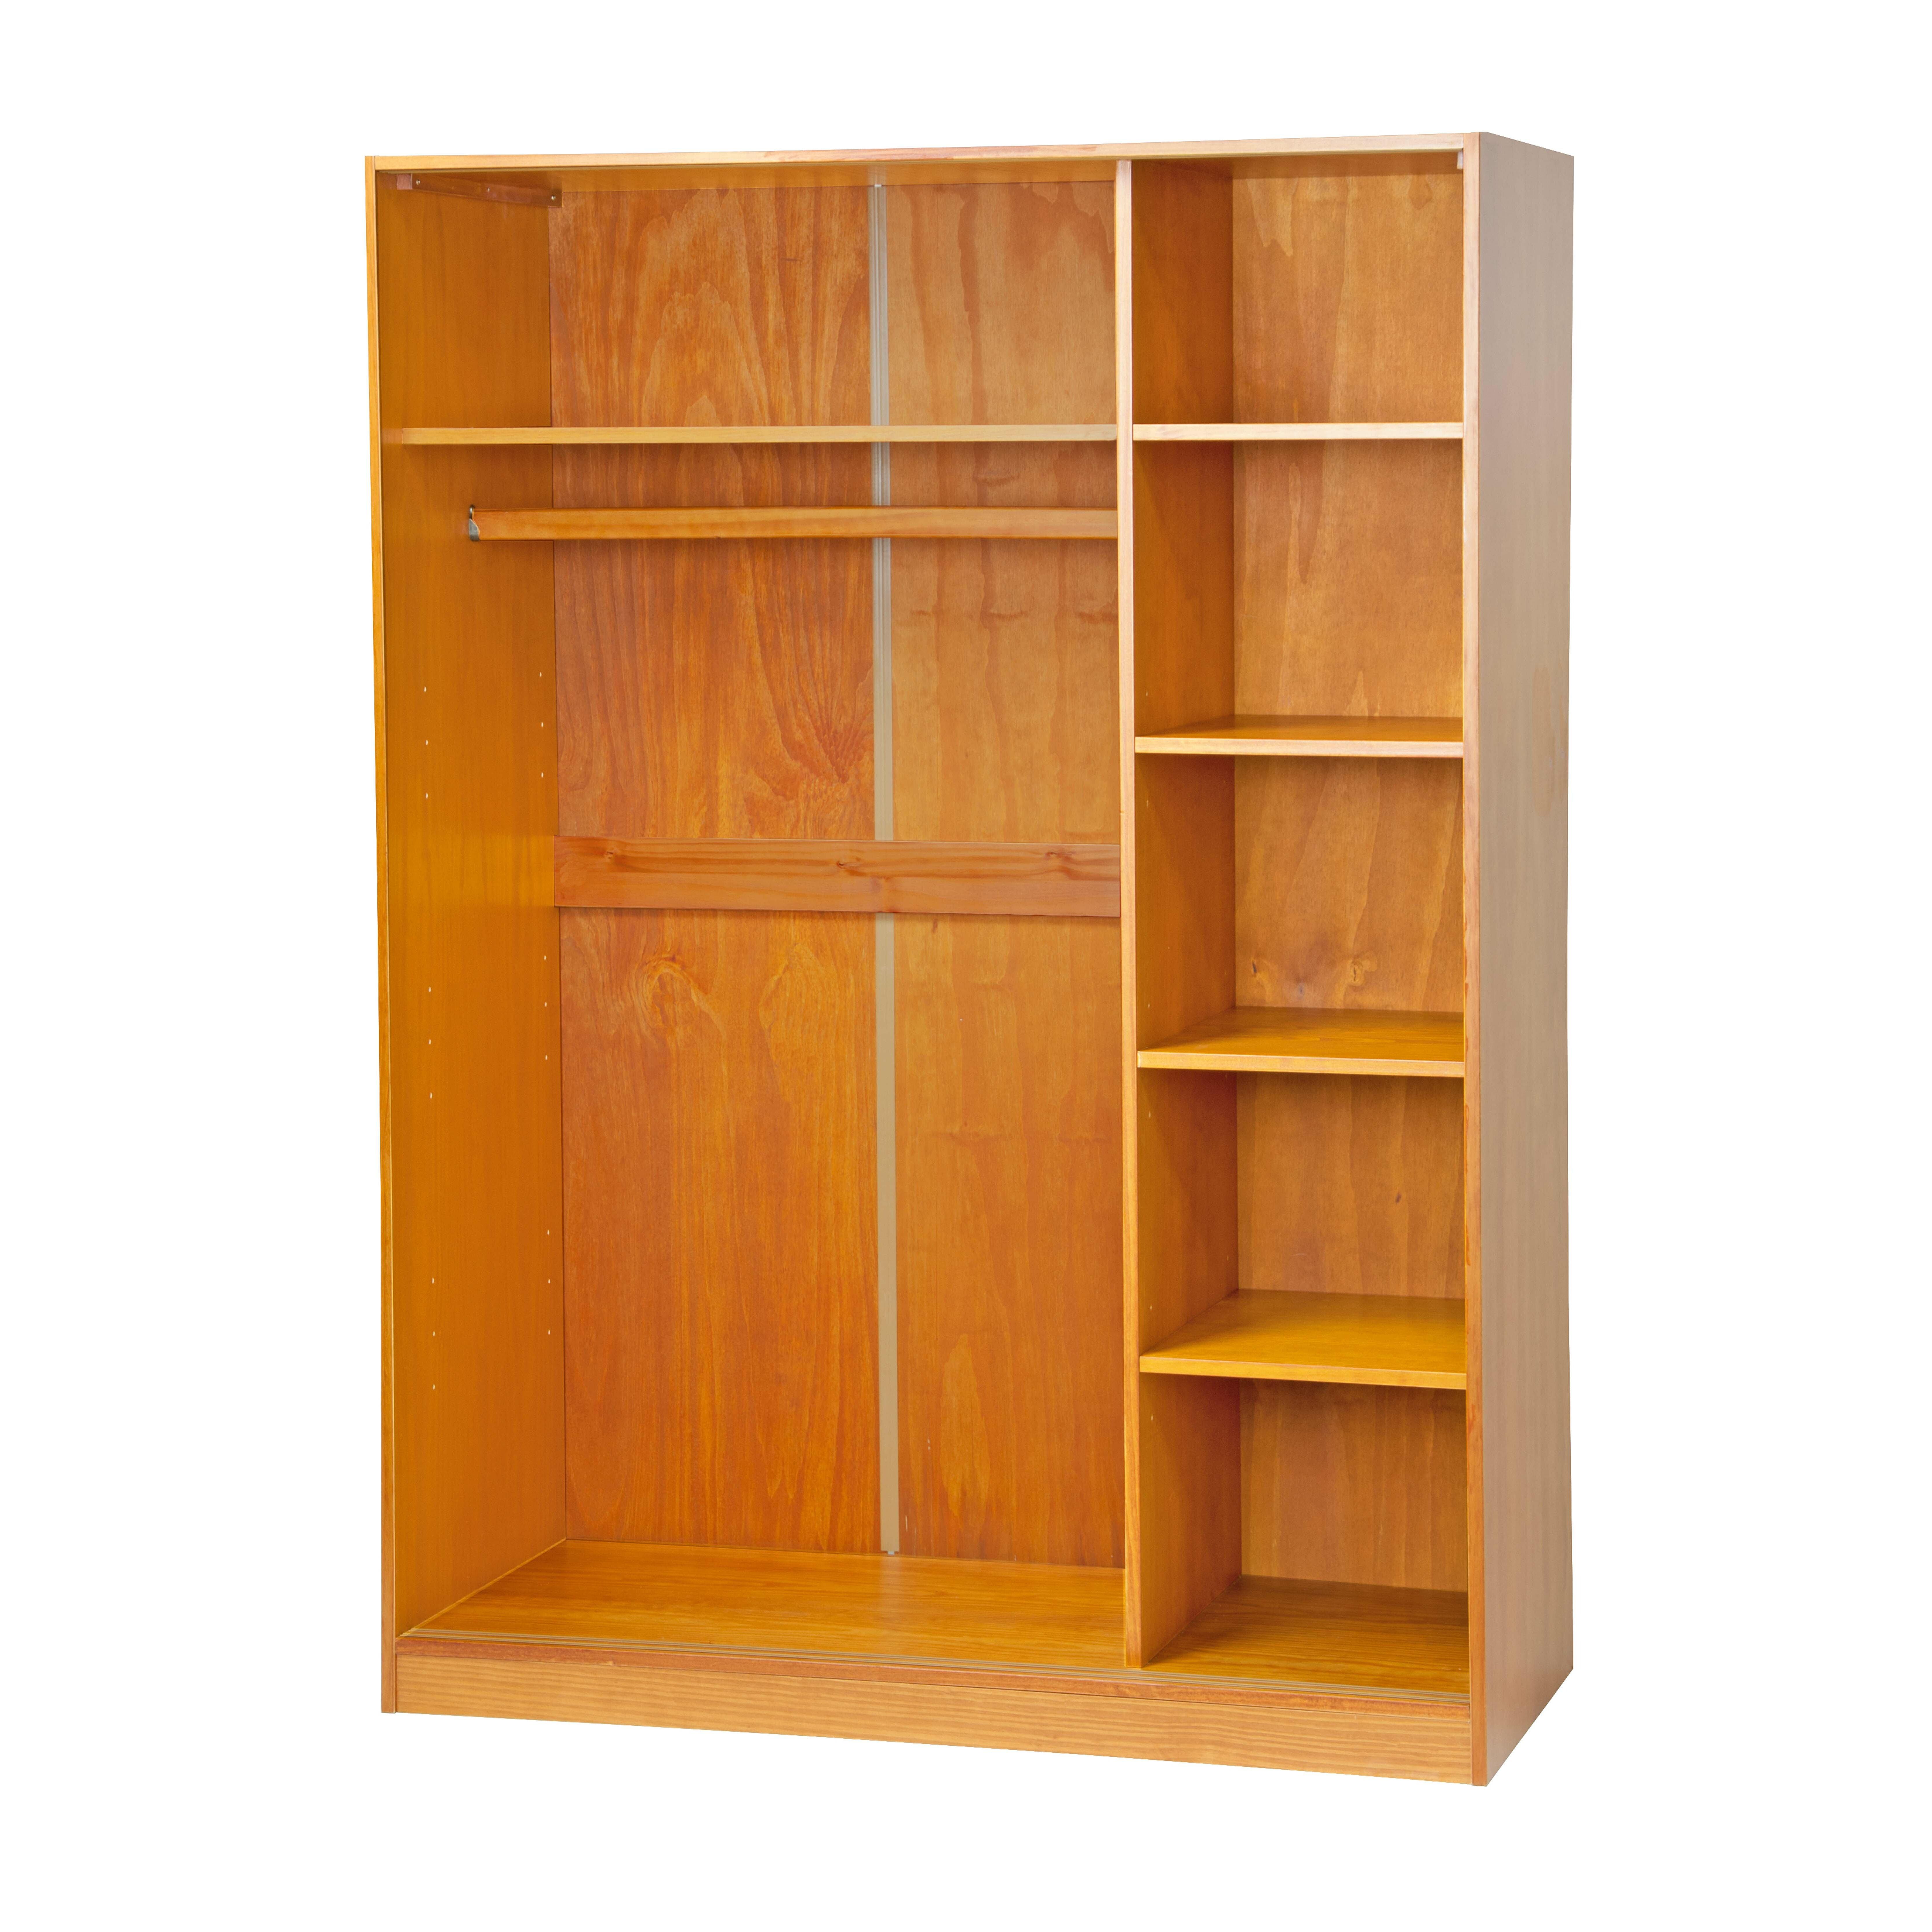 wardrobe wardrobe palaceimports armoire reviews wayfair  -  solid wood smart wardrobe armoire closet